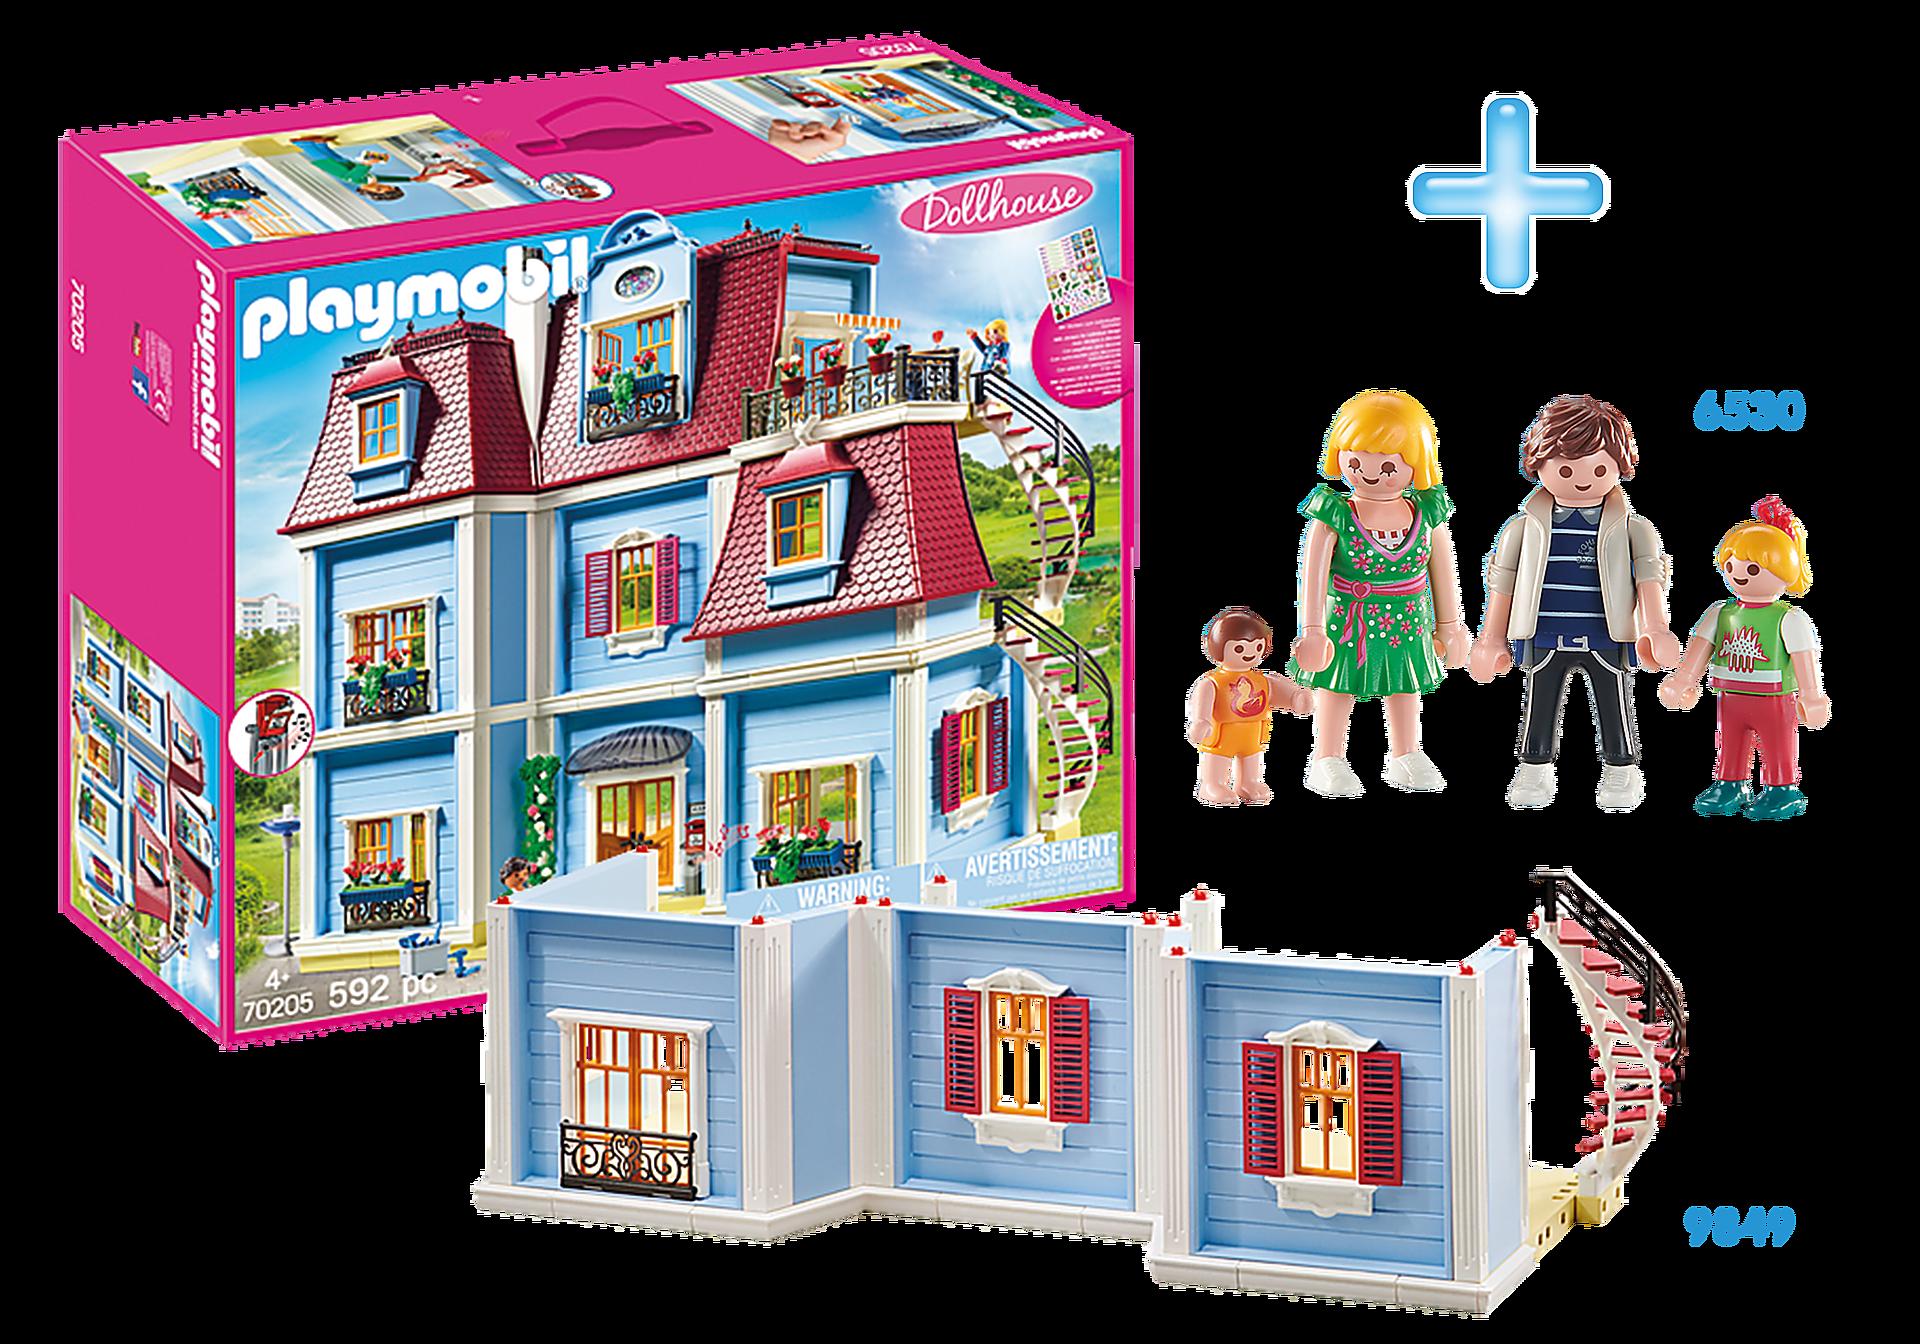 Bundle Puppenhaus Ii Pm1911e Playmobil Deutschland Playmobil Puppenhaus Playmobil Haus